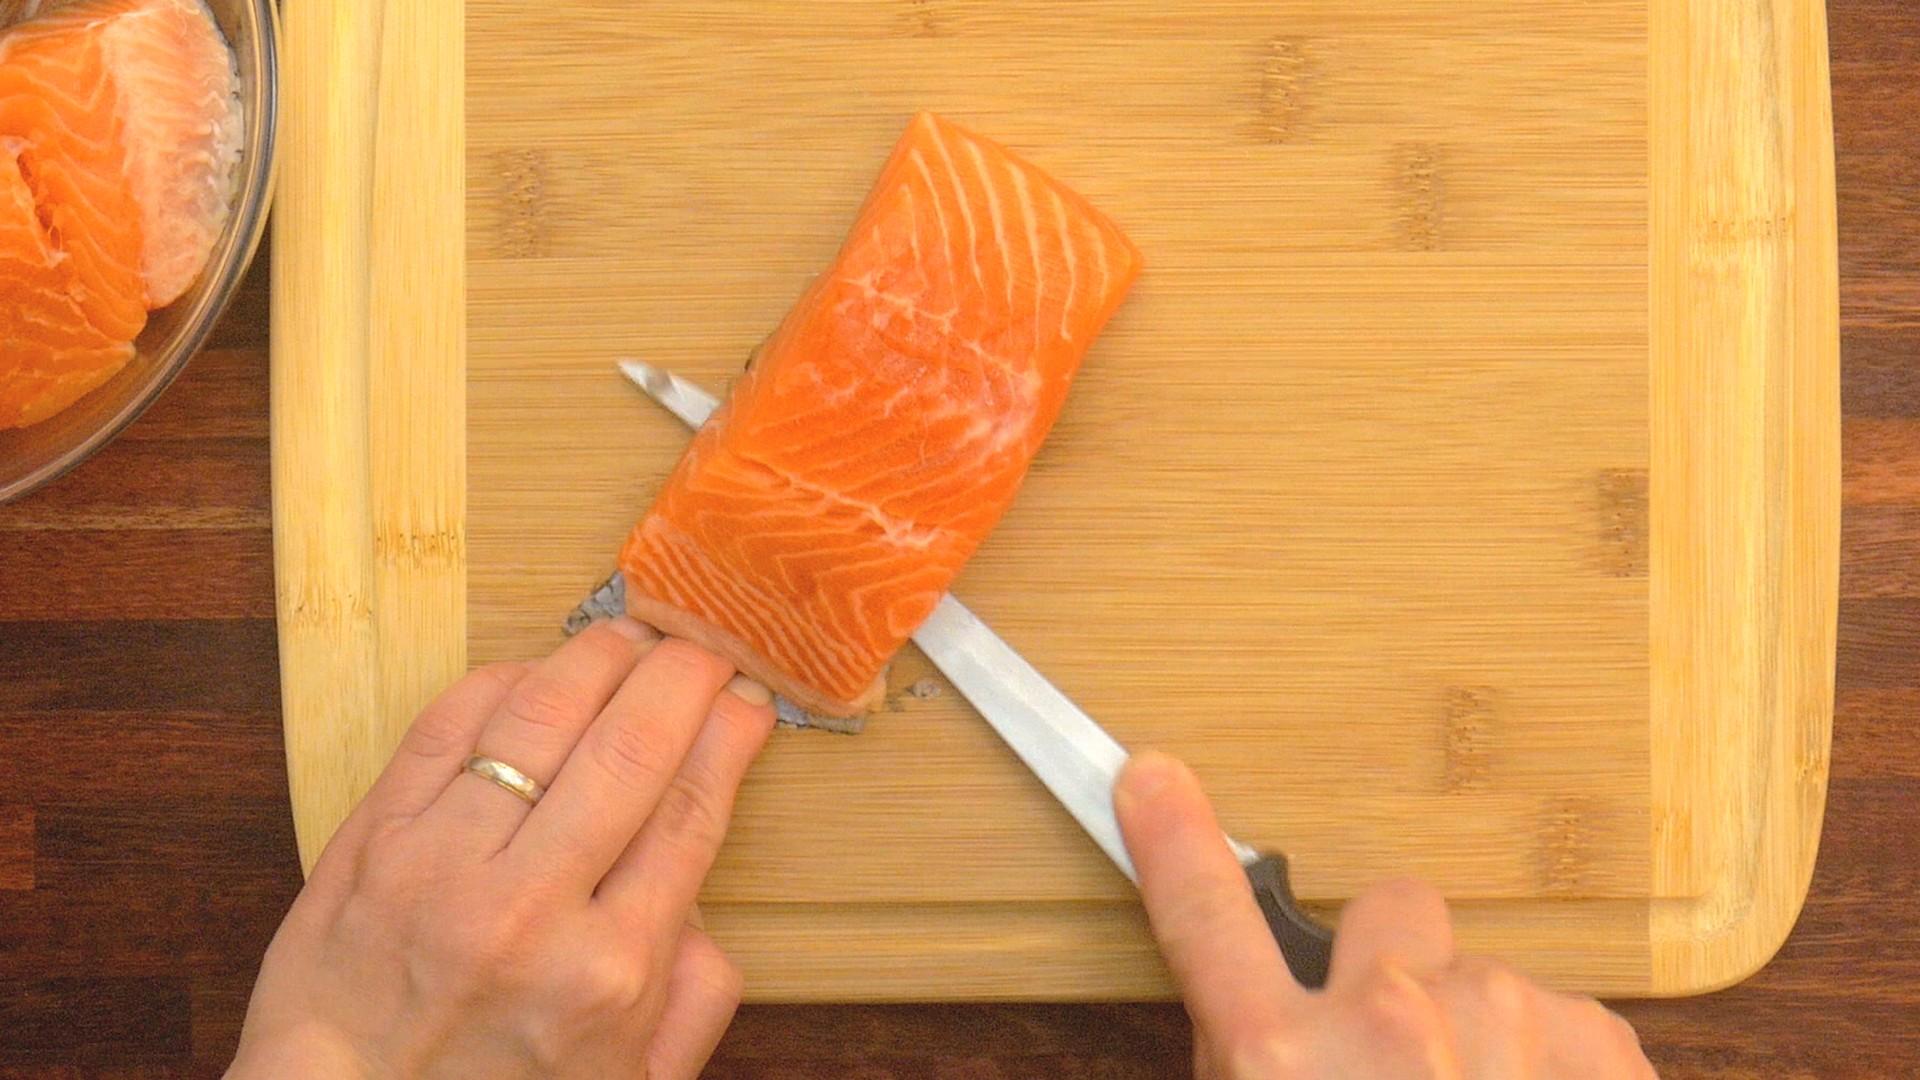 S1E3 Herbs Crusted Salmon Take 1